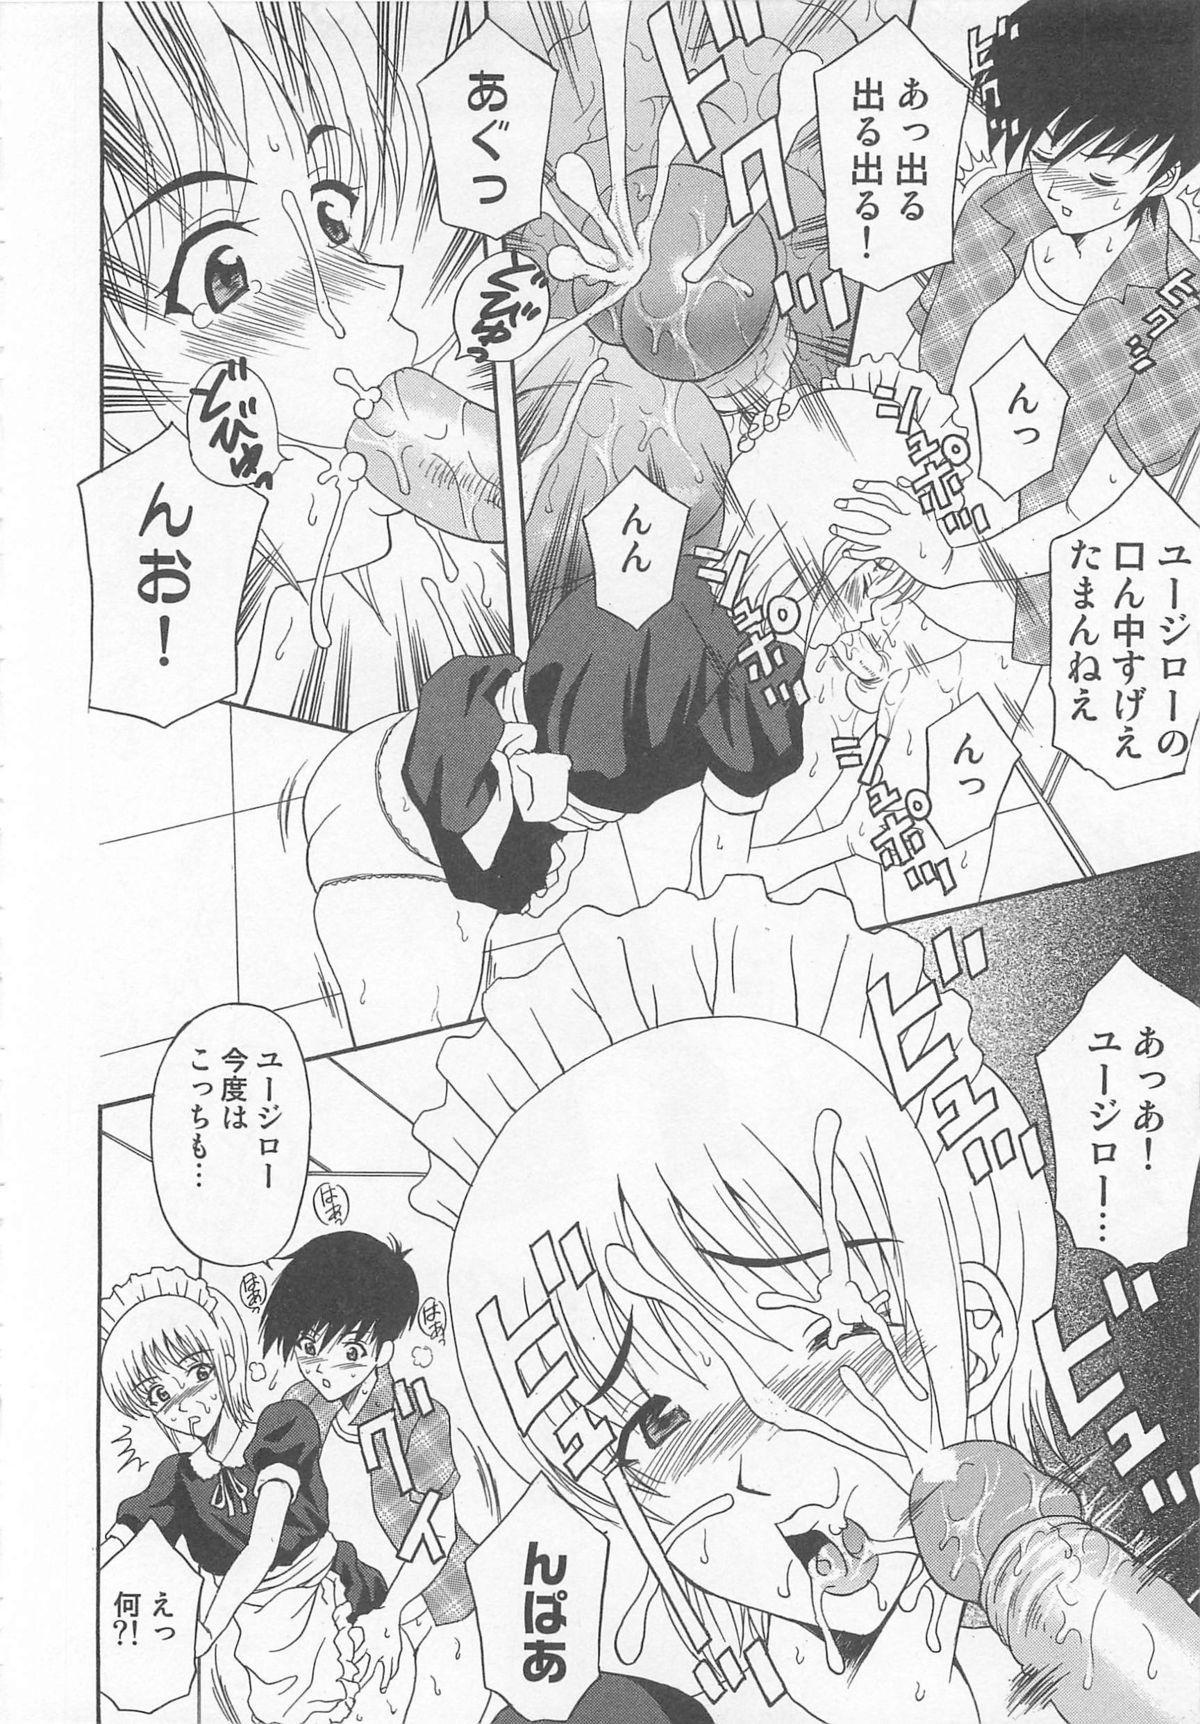 Otokonoko HEAVEN Vol. 02 Dokidoki Chikan Taiken 82